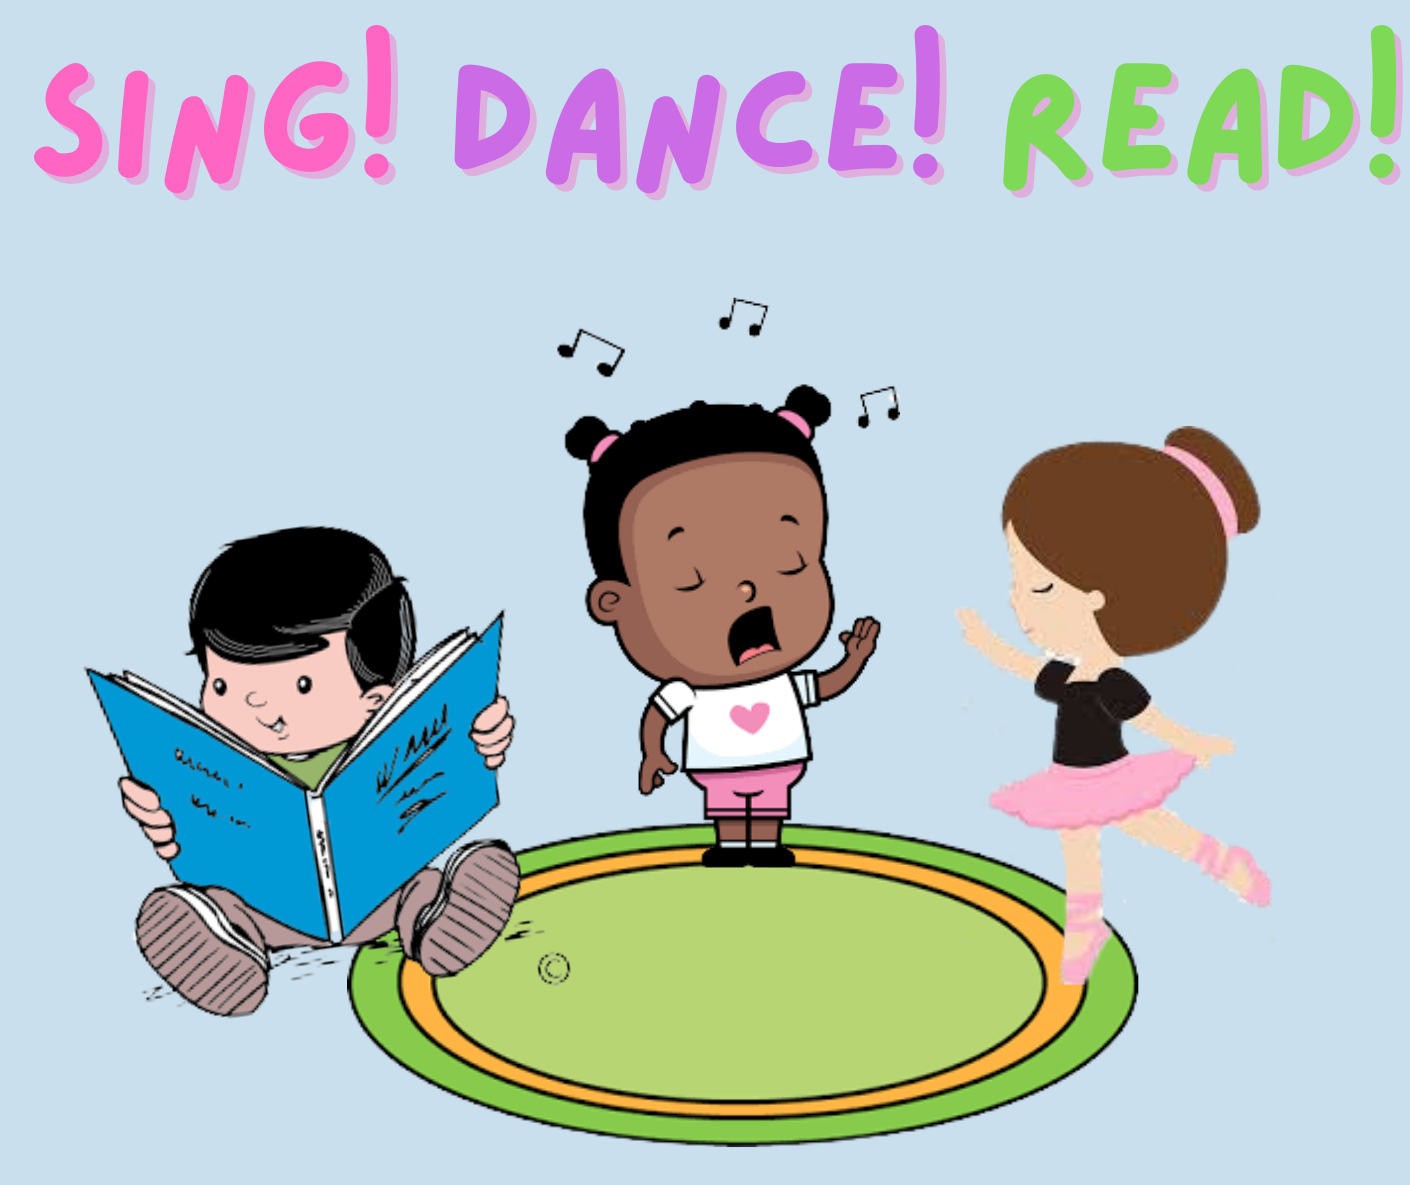 Sing! Dance! Read!